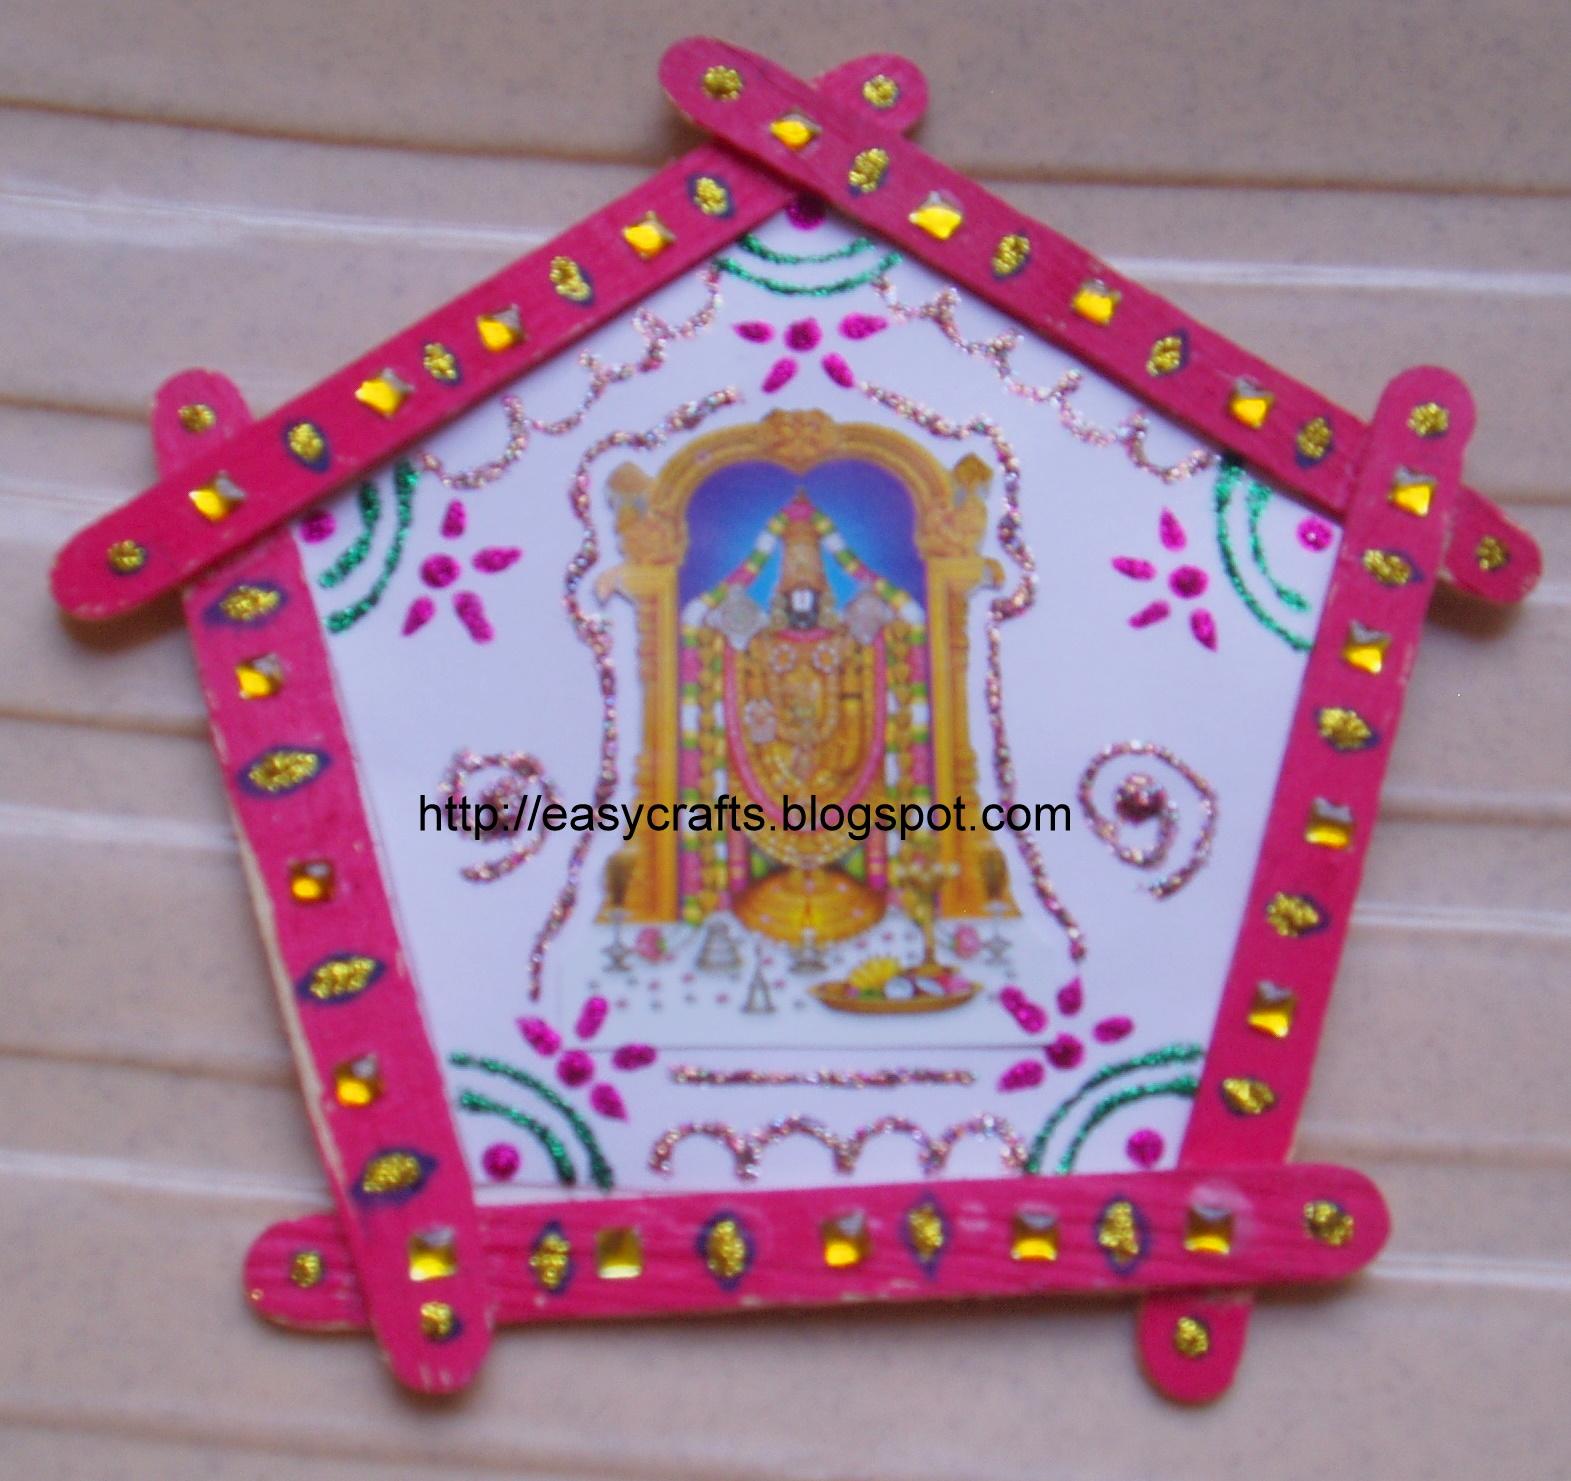 Icecream stick hanging also easy crafts explore your creativity rh easycraftsspot